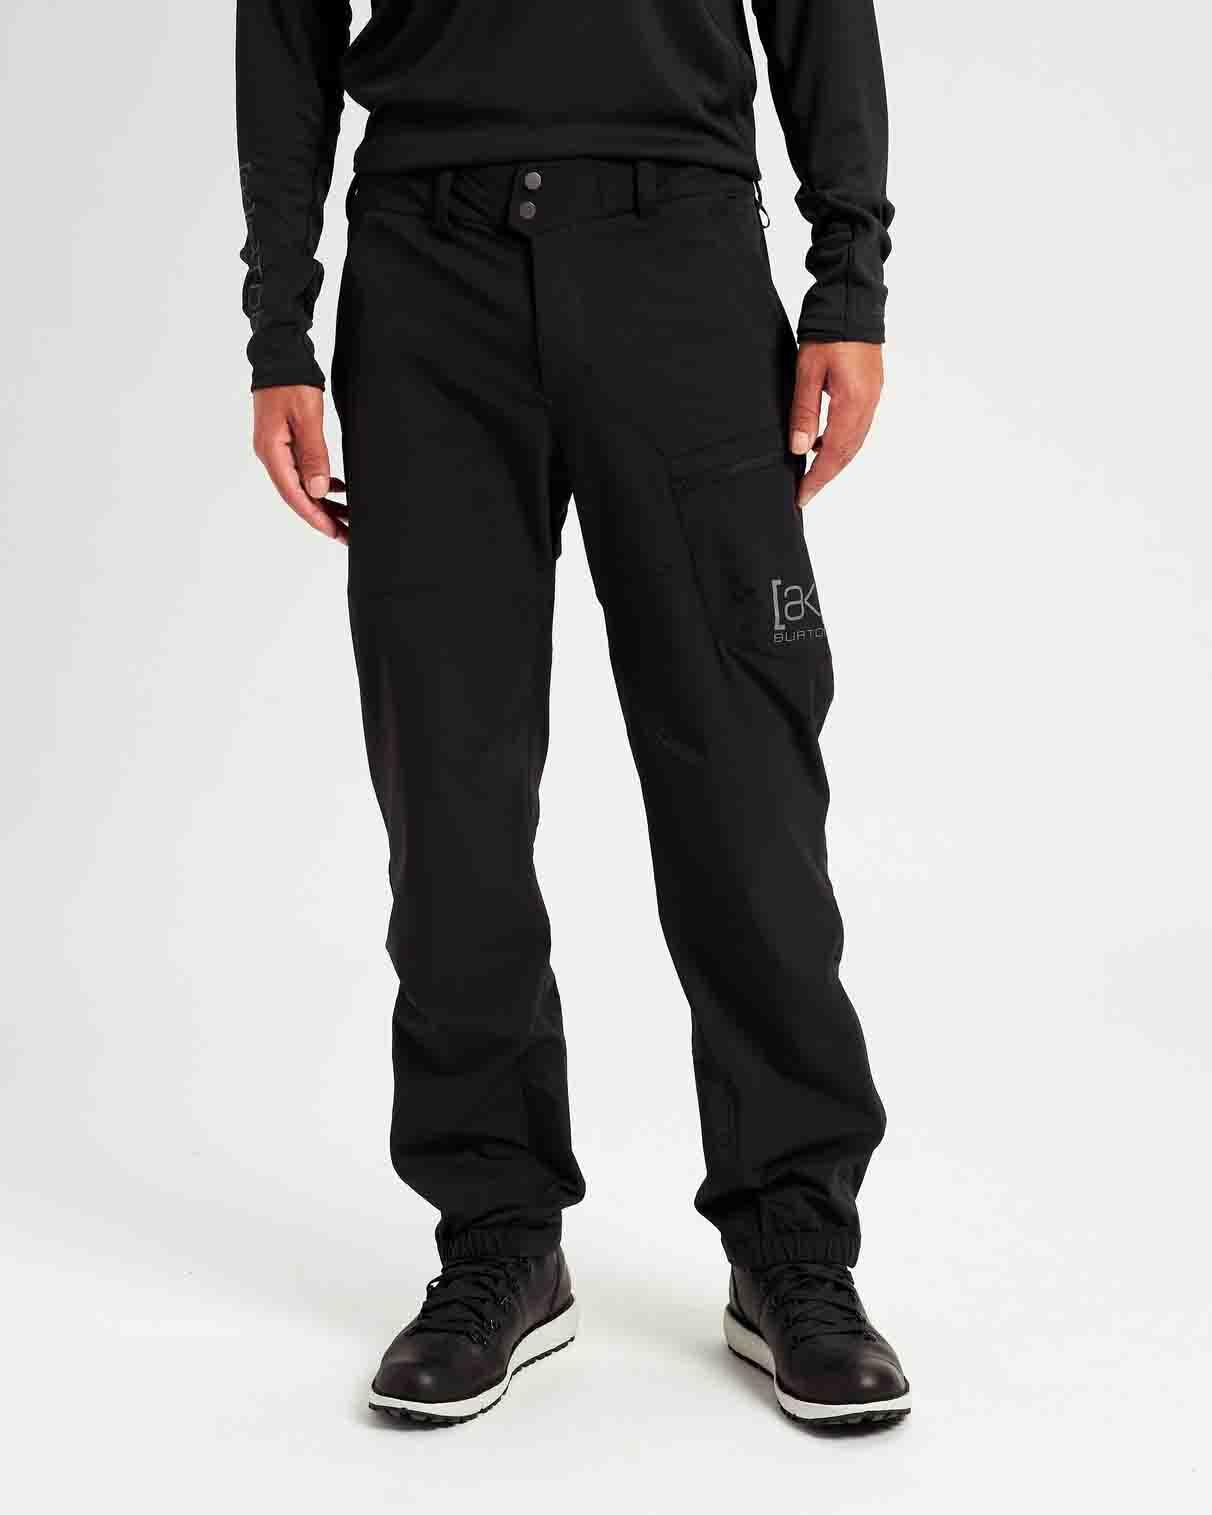 Burton 21/22 Men's Outerwear